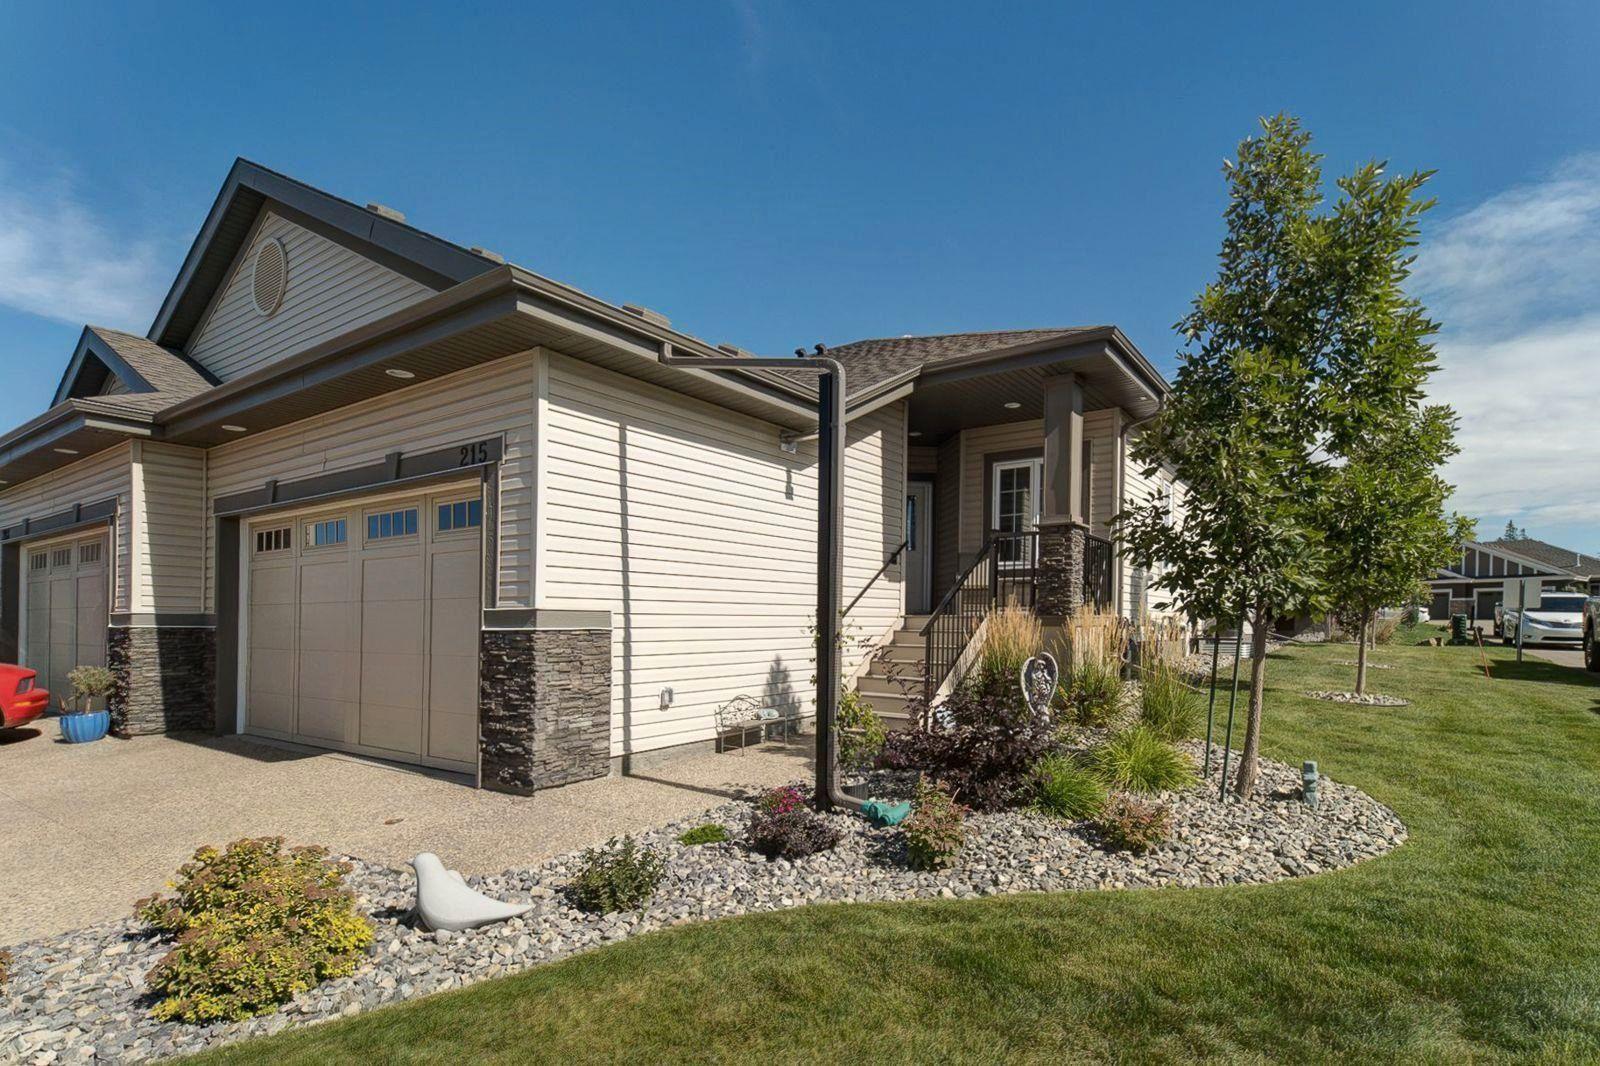 Main Photo: 215 50 HEATHERGLEN Drive: Spruce Grove House Half Duplex for sale : MLS®# E4263585